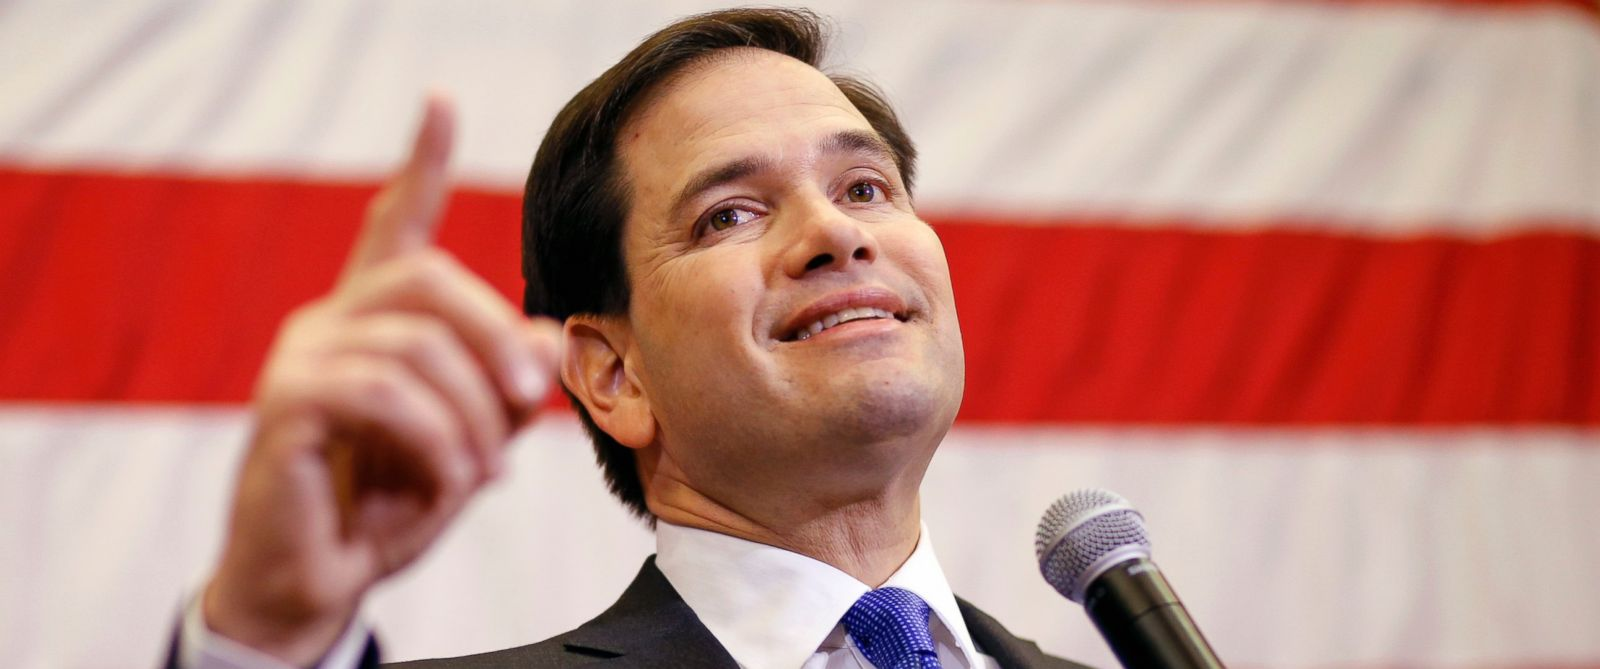 PHOTO: Republican presidential candidate, Sen. Marco Rubio, R-Fla. speaks at a town hall meeting in Cedar Rapids, Iowa, Jan. 5, 2016.